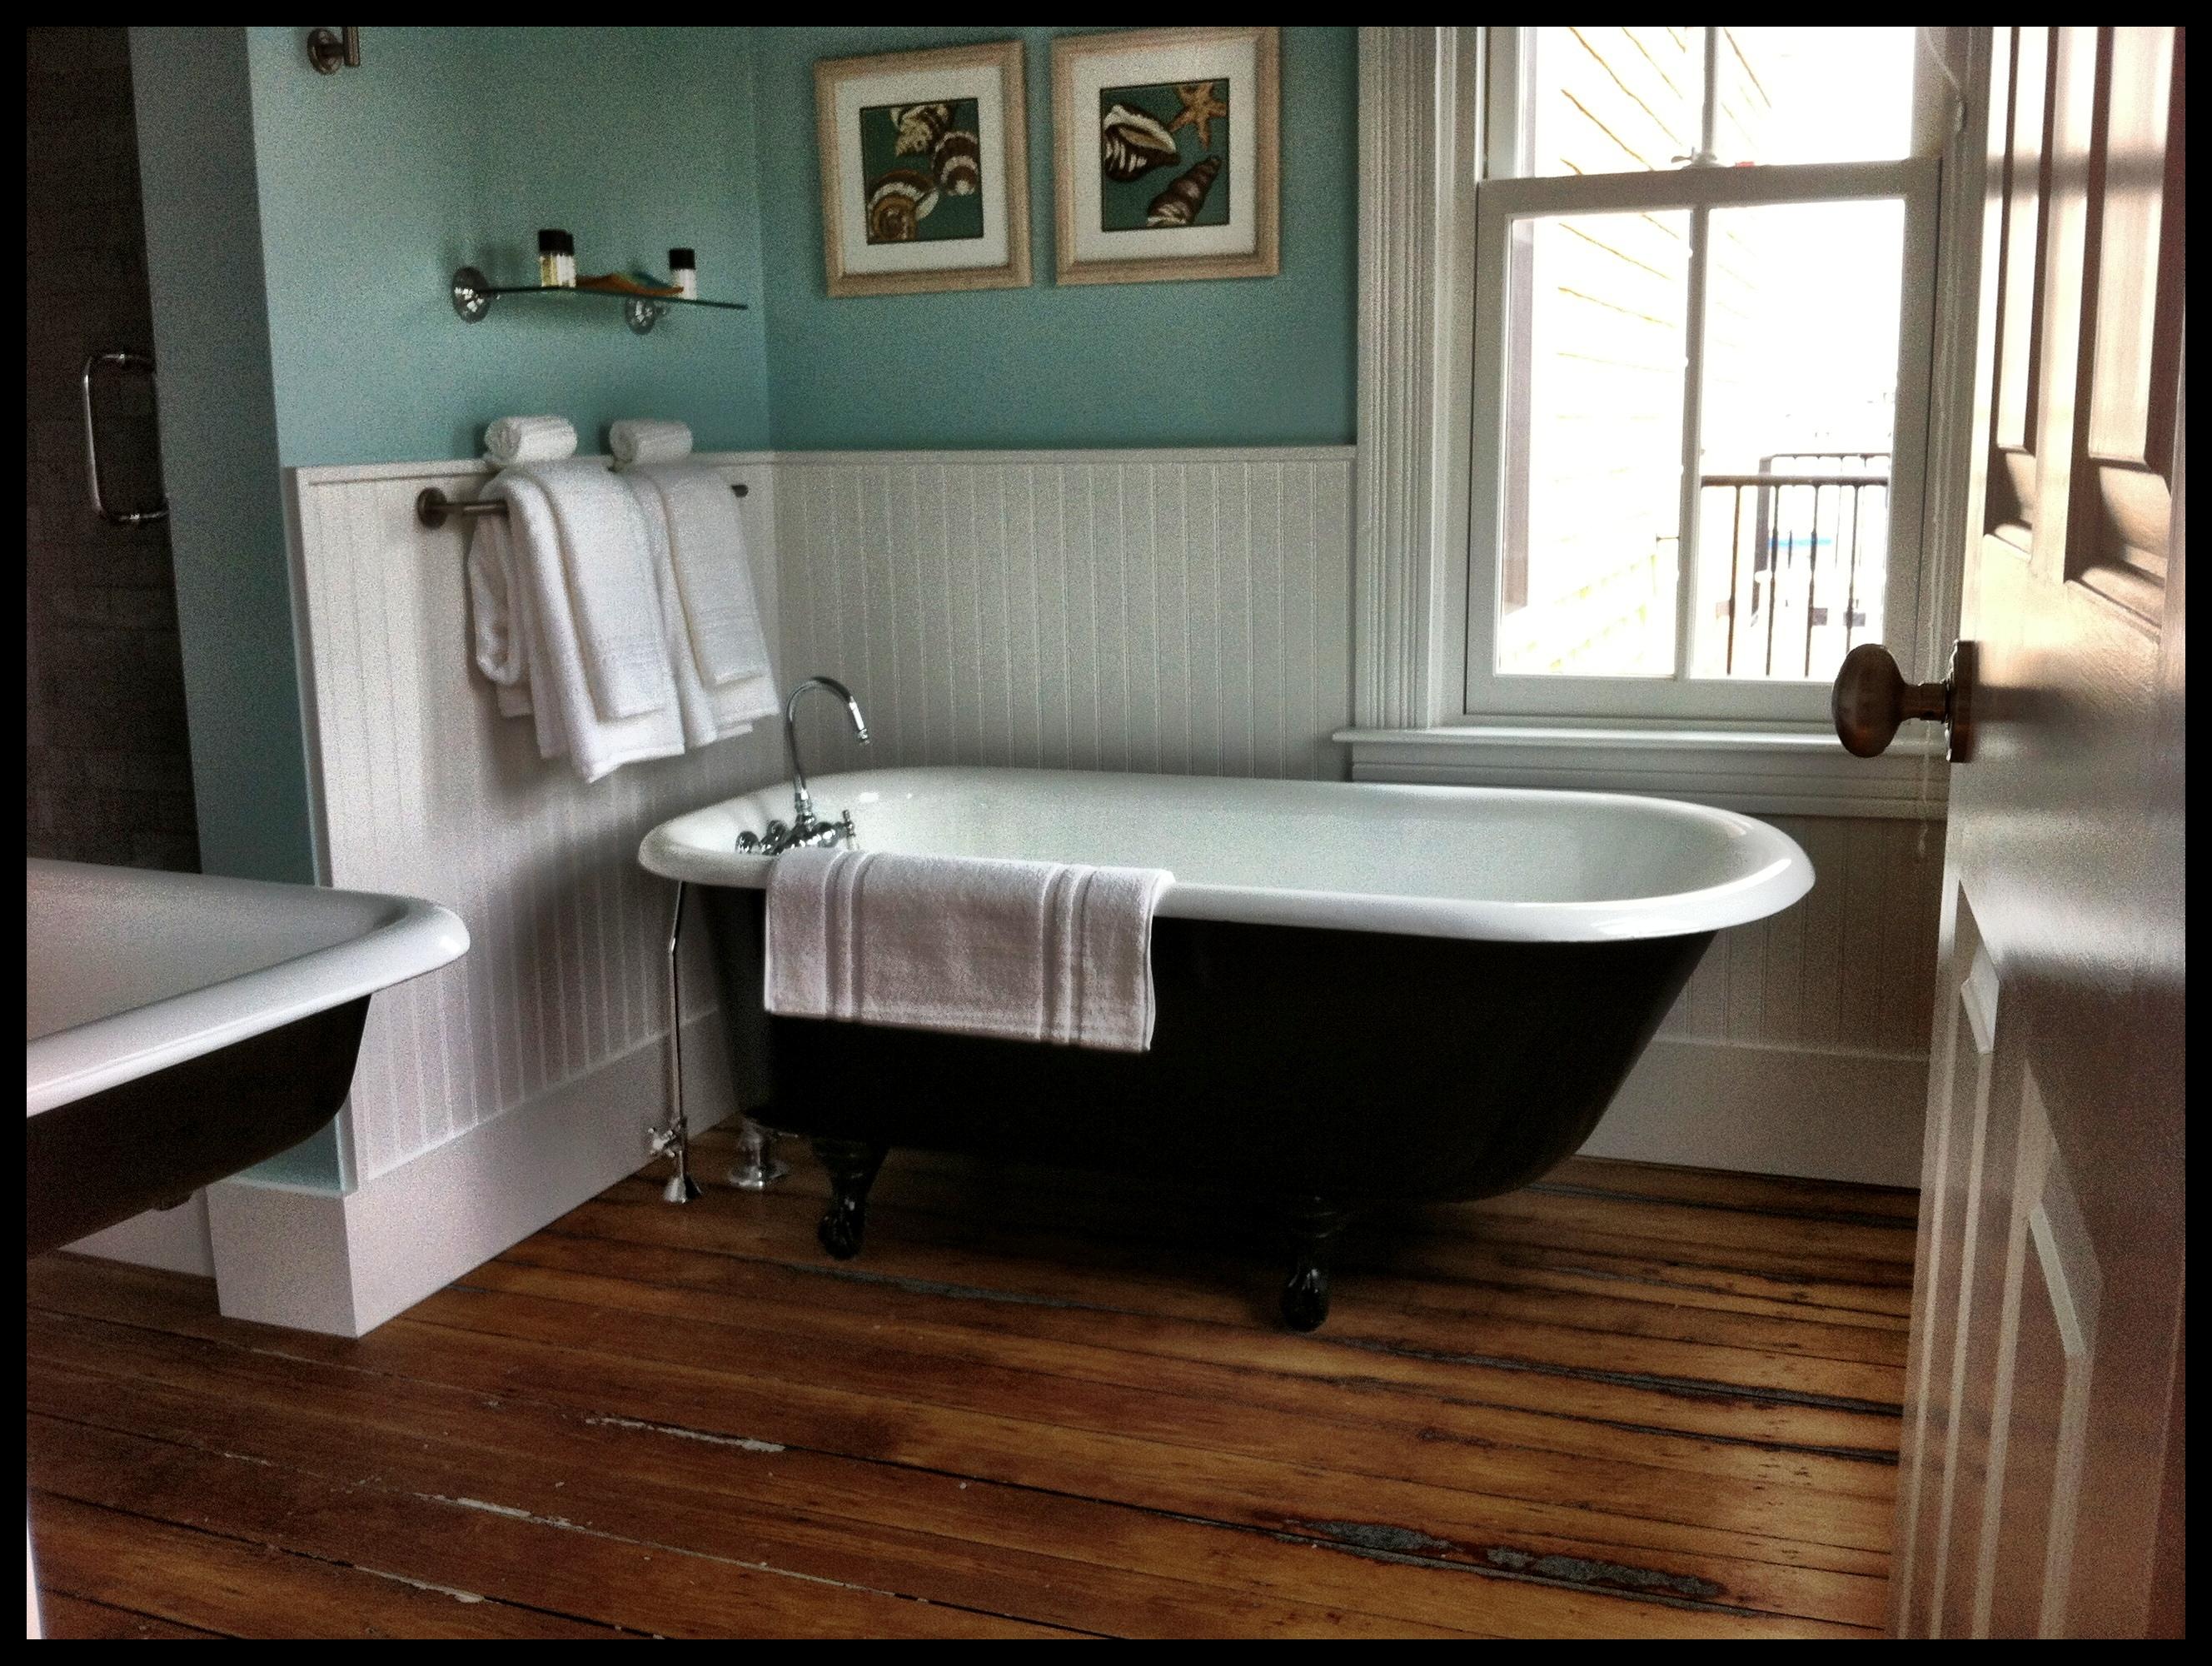 Fine Painting A Bathtub Tiny Bath Tub Paint Clean Painting Bathtub Bathtub Refinishers Young Bathtub Repair Contractor White Can I Paint My Bathtub